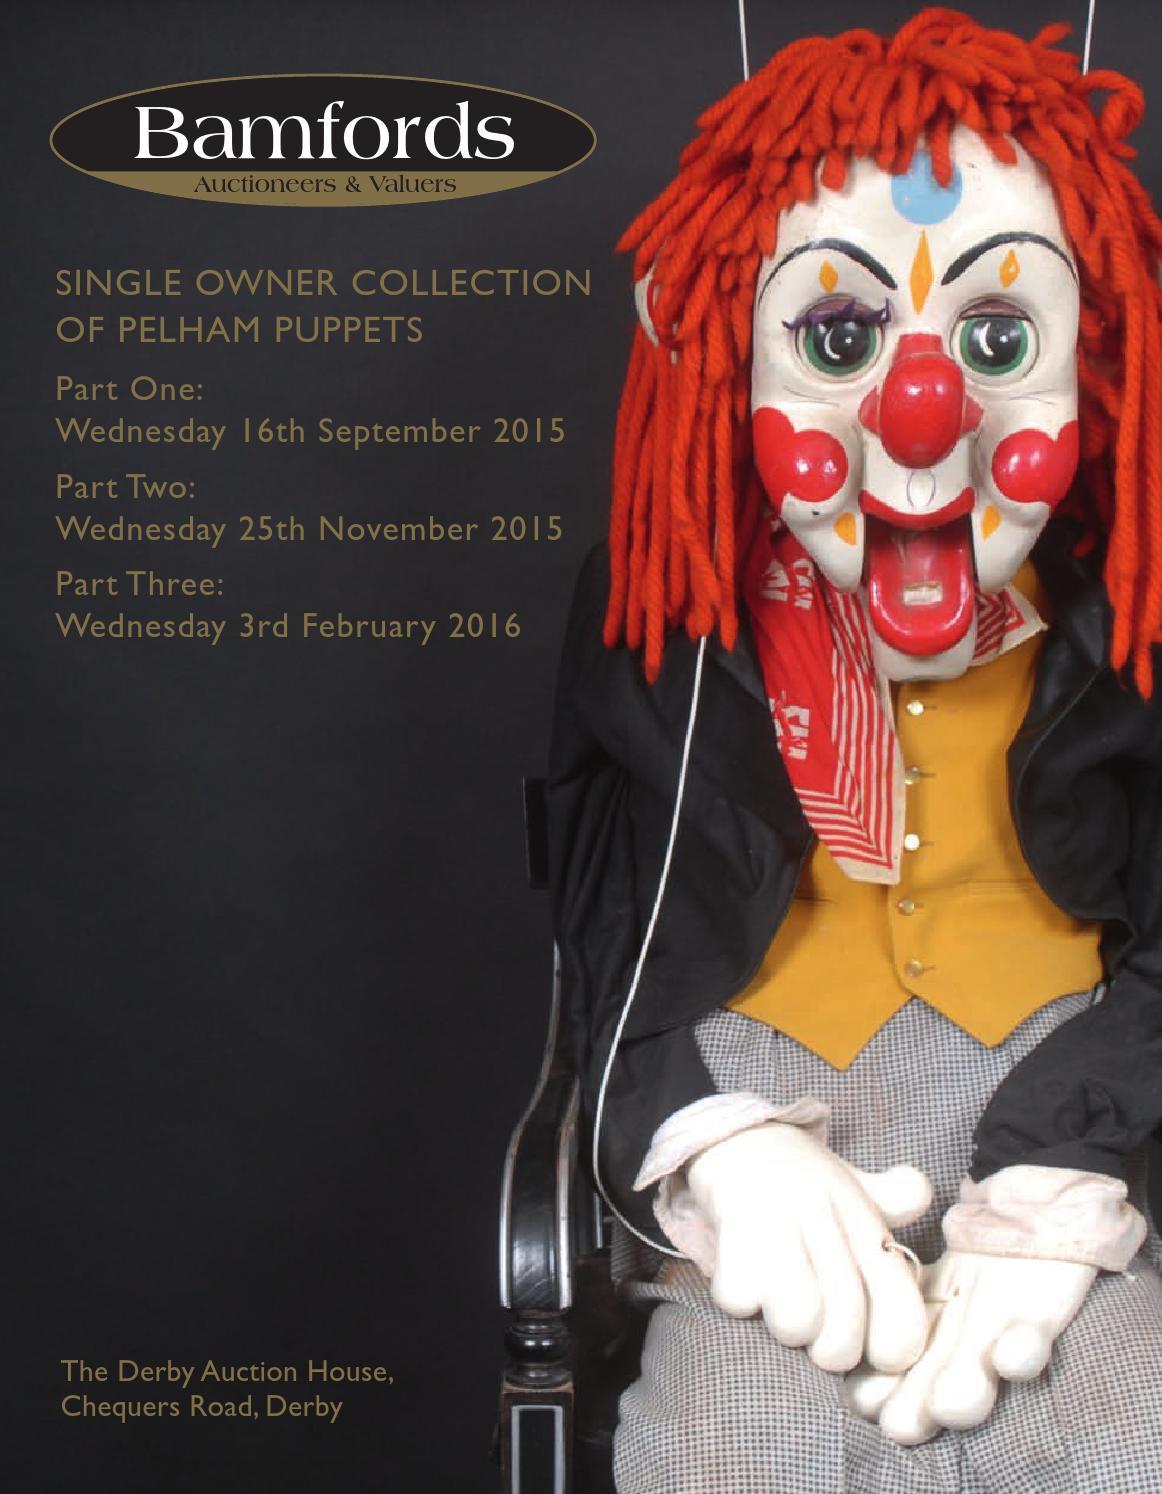 Wood Puppet England Puppet Pelham,England Doll,England Toy,Blonde Puppet Marionette Girl Puppet Retro Puppet Pelham Puppet 50s Puppet